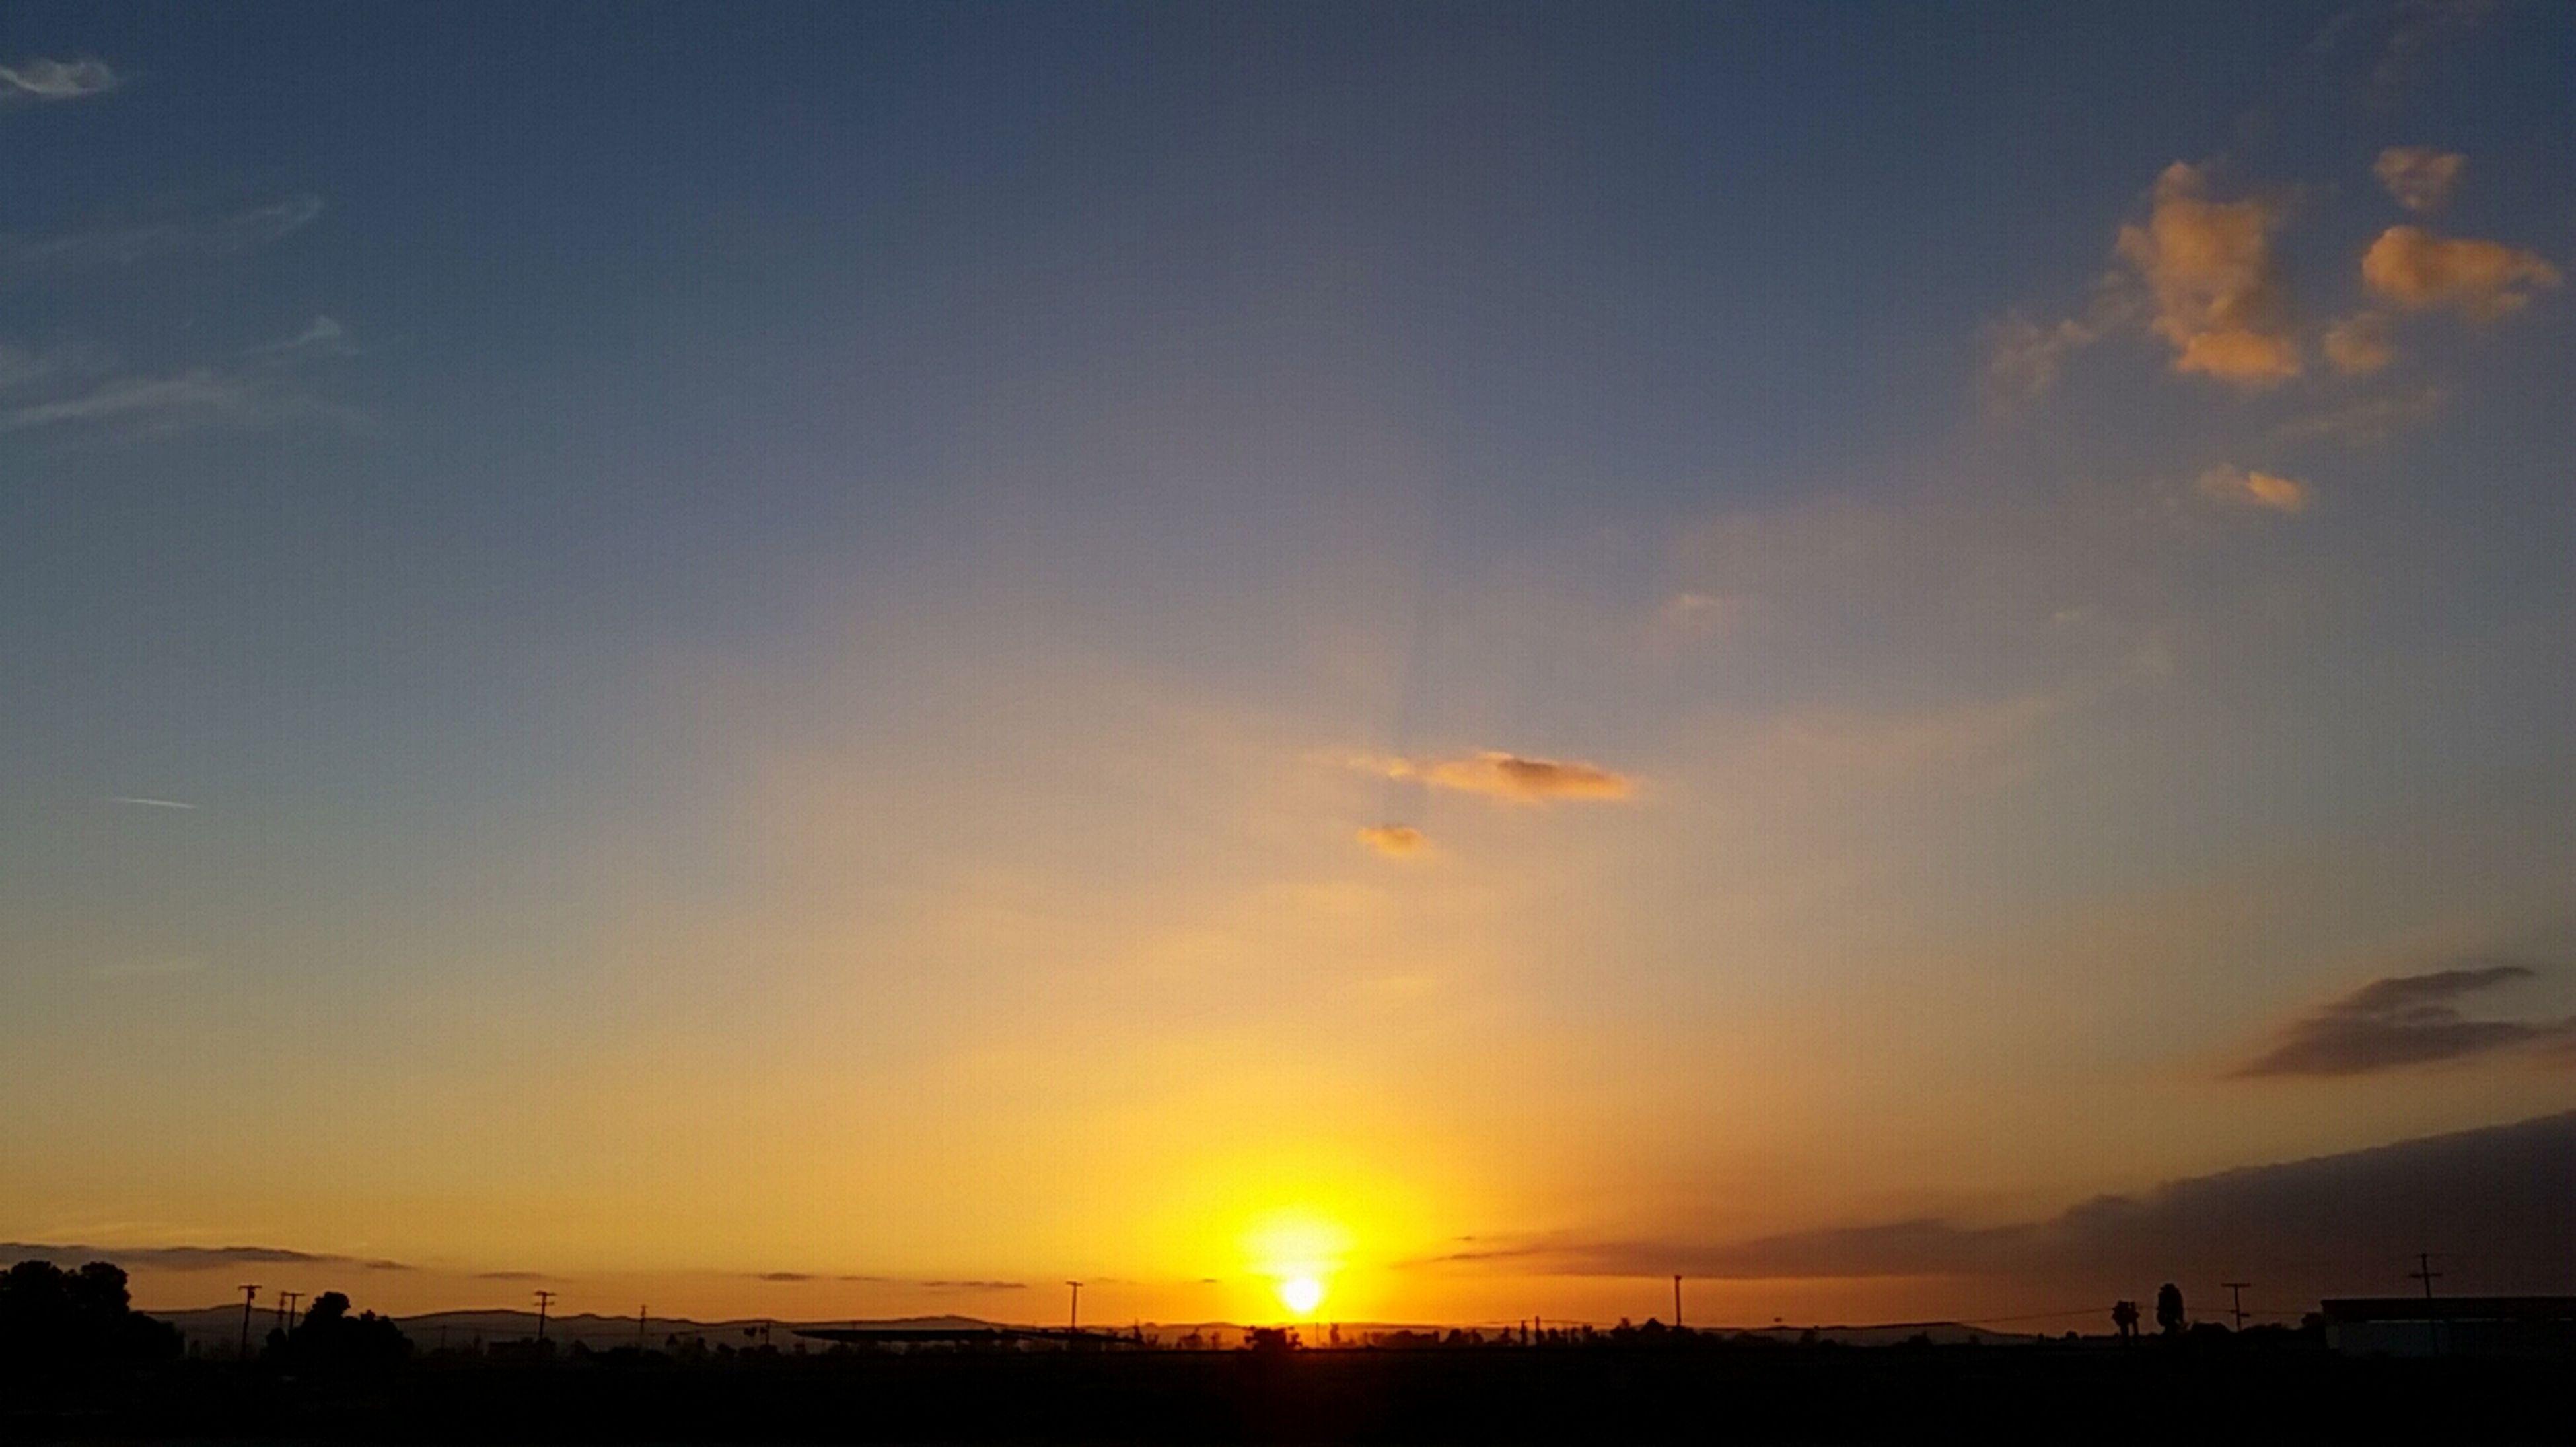 sunset, sun, sea, water, scenics, tranquil scene, beauty in nature, horizon over water, sky, silhouette, tranquility, orange color, beach, nature, idyllic, sunlight, sunbeam, shore, incidental people, outdoors